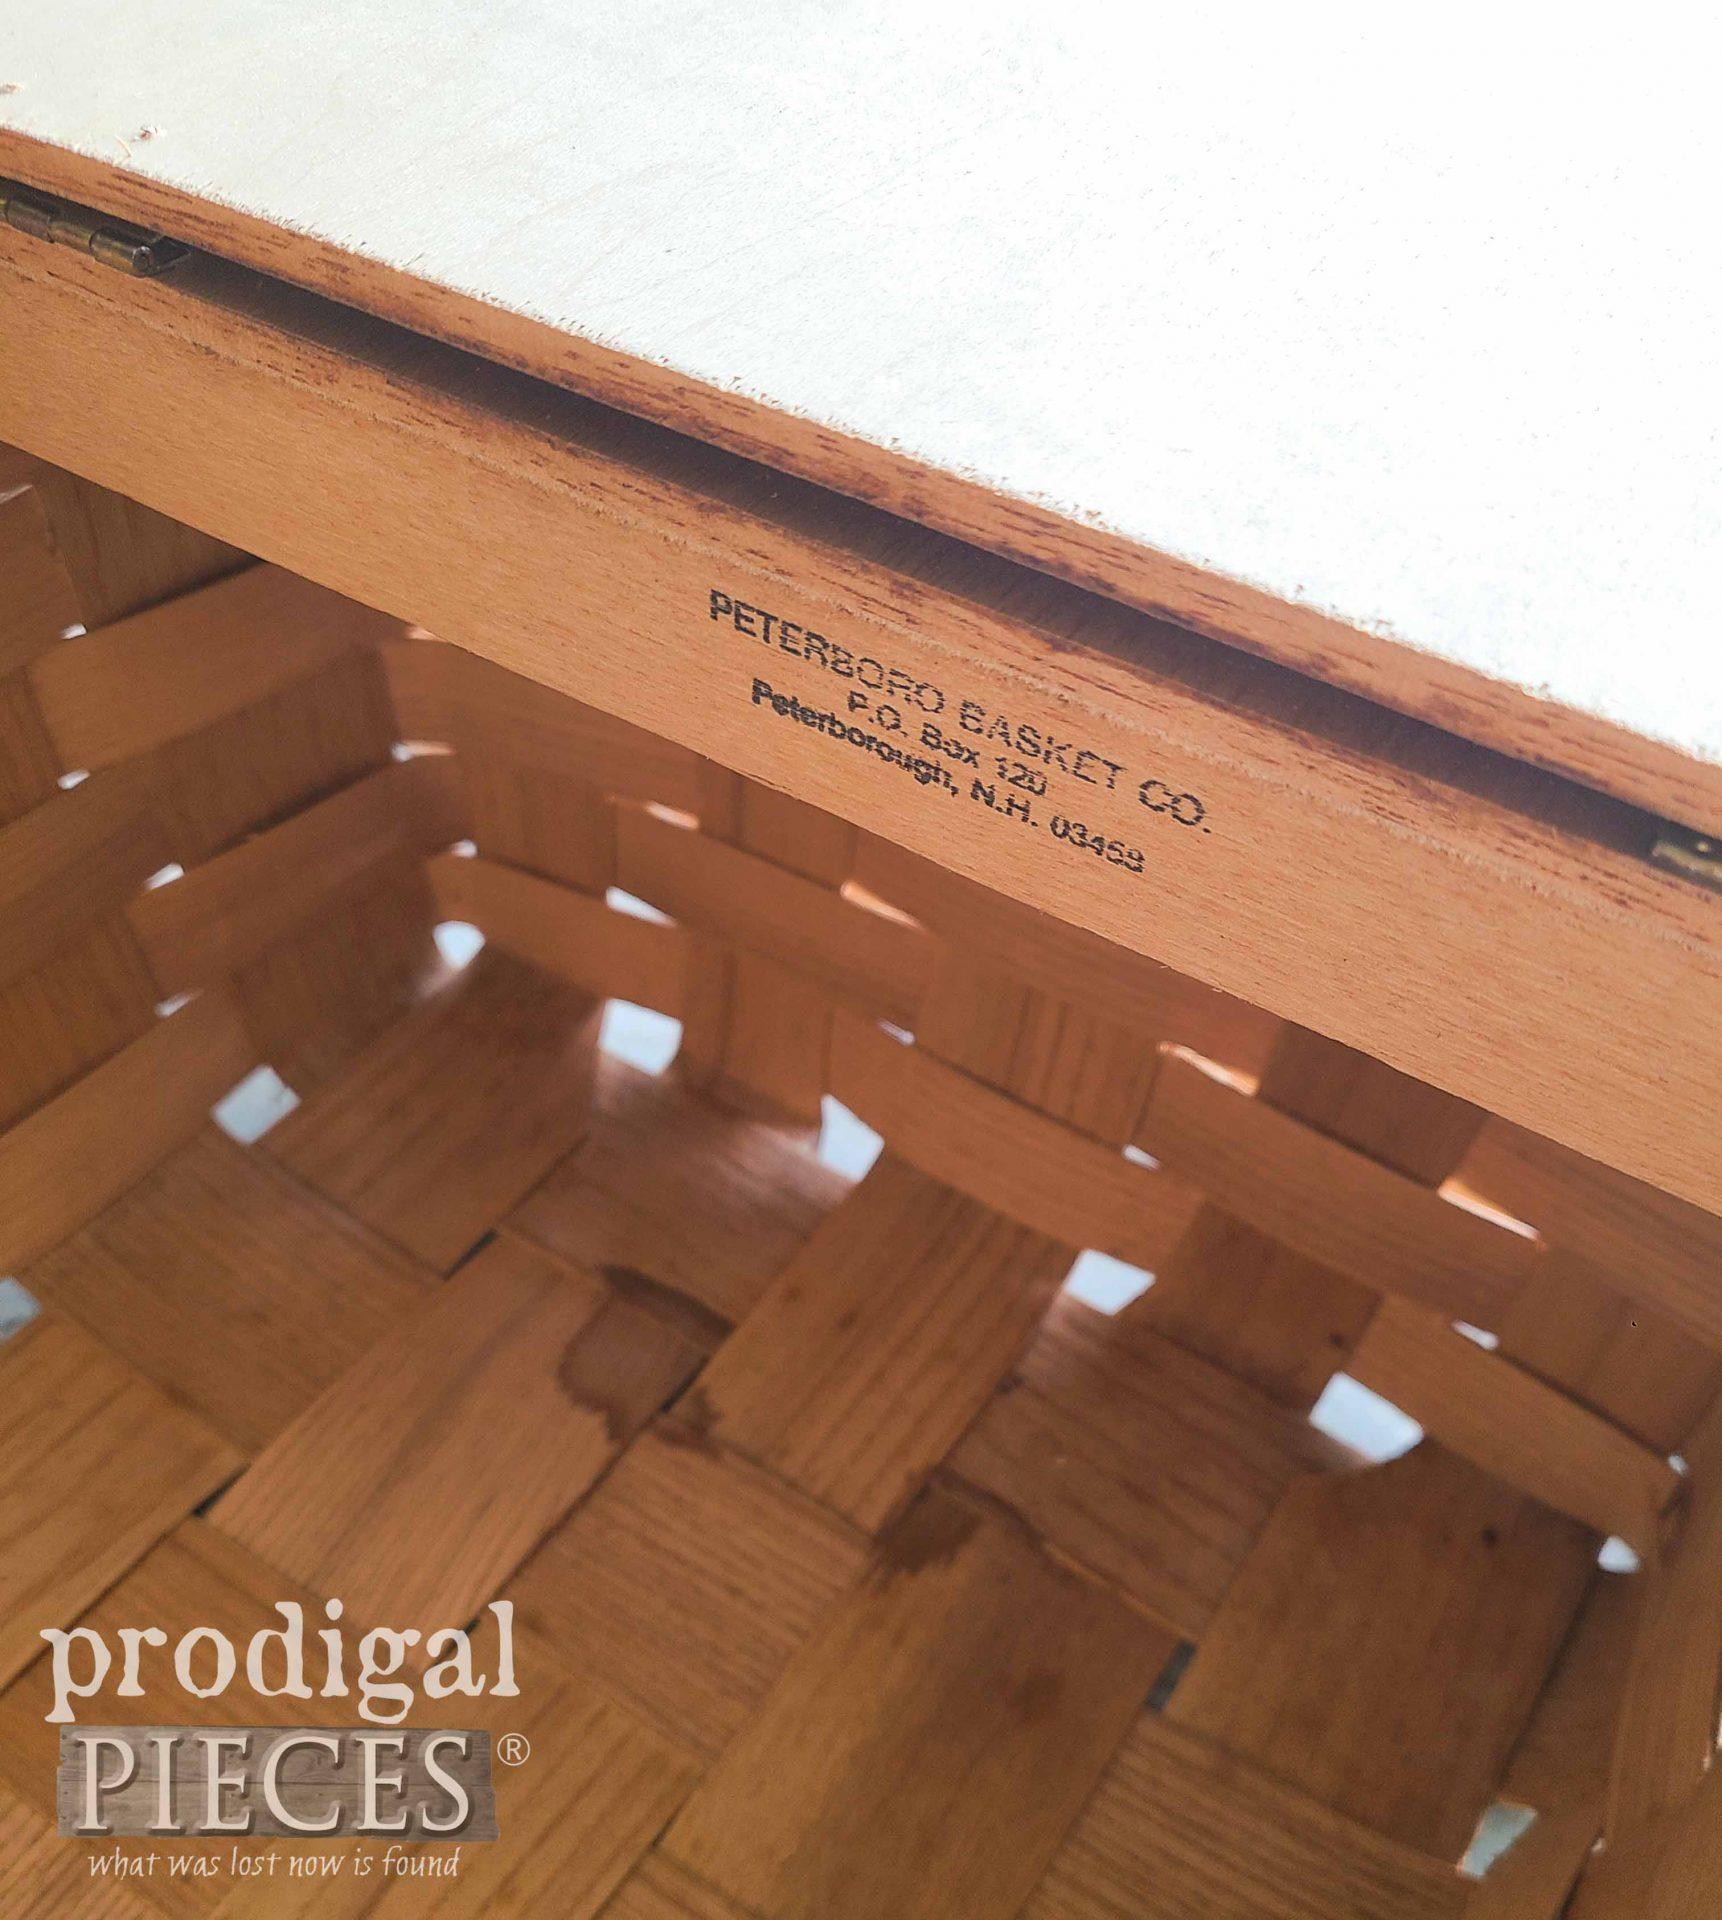 Peterboro Picnic Basket | prodigalpieces.com